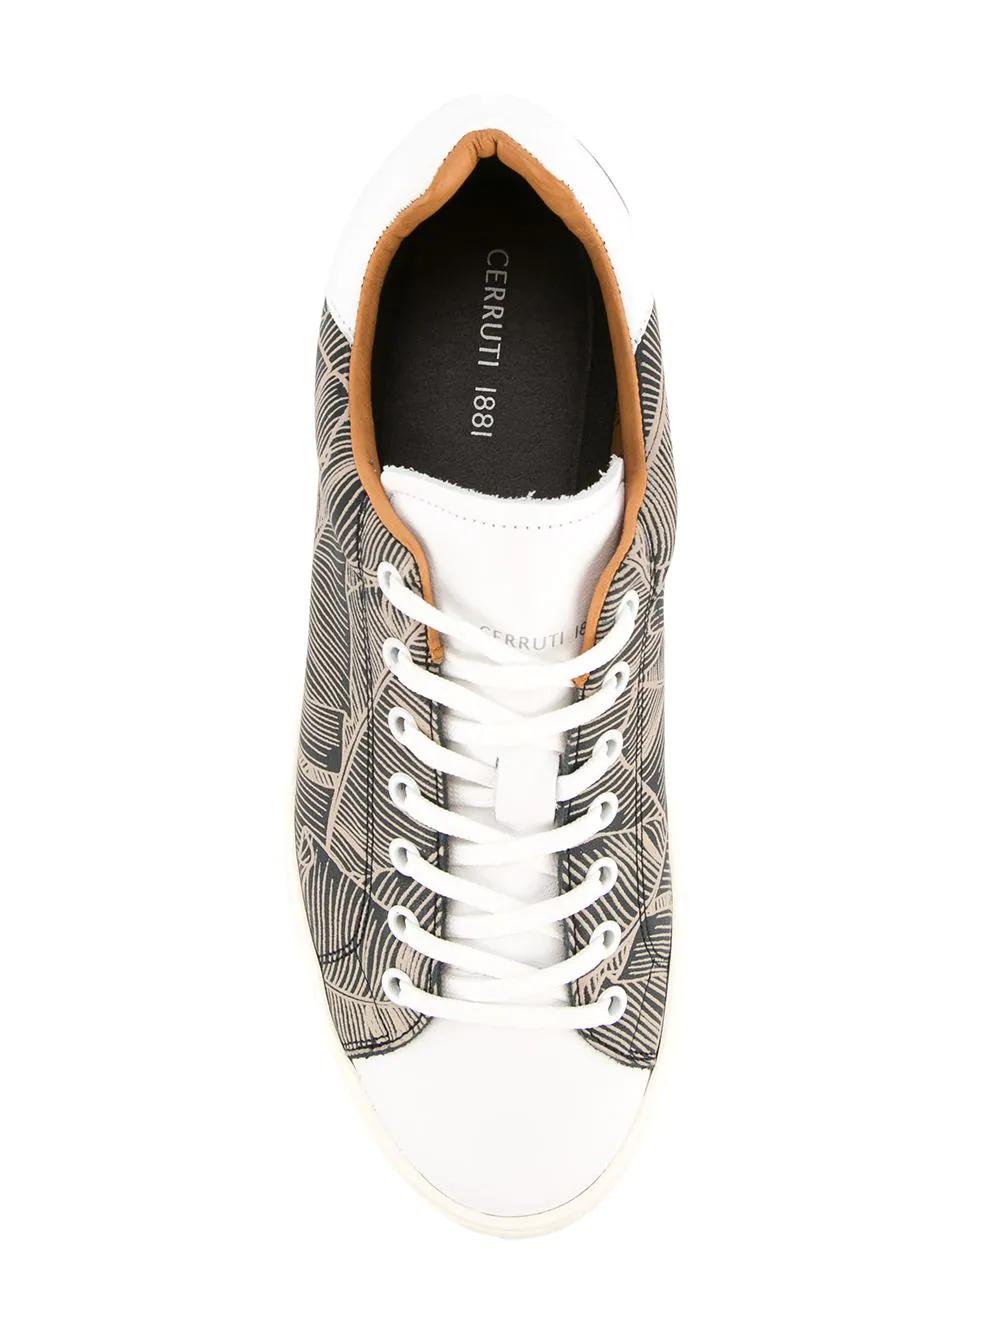 Cerruti 1881 | кроссовки на платформе с принтом | Clouty